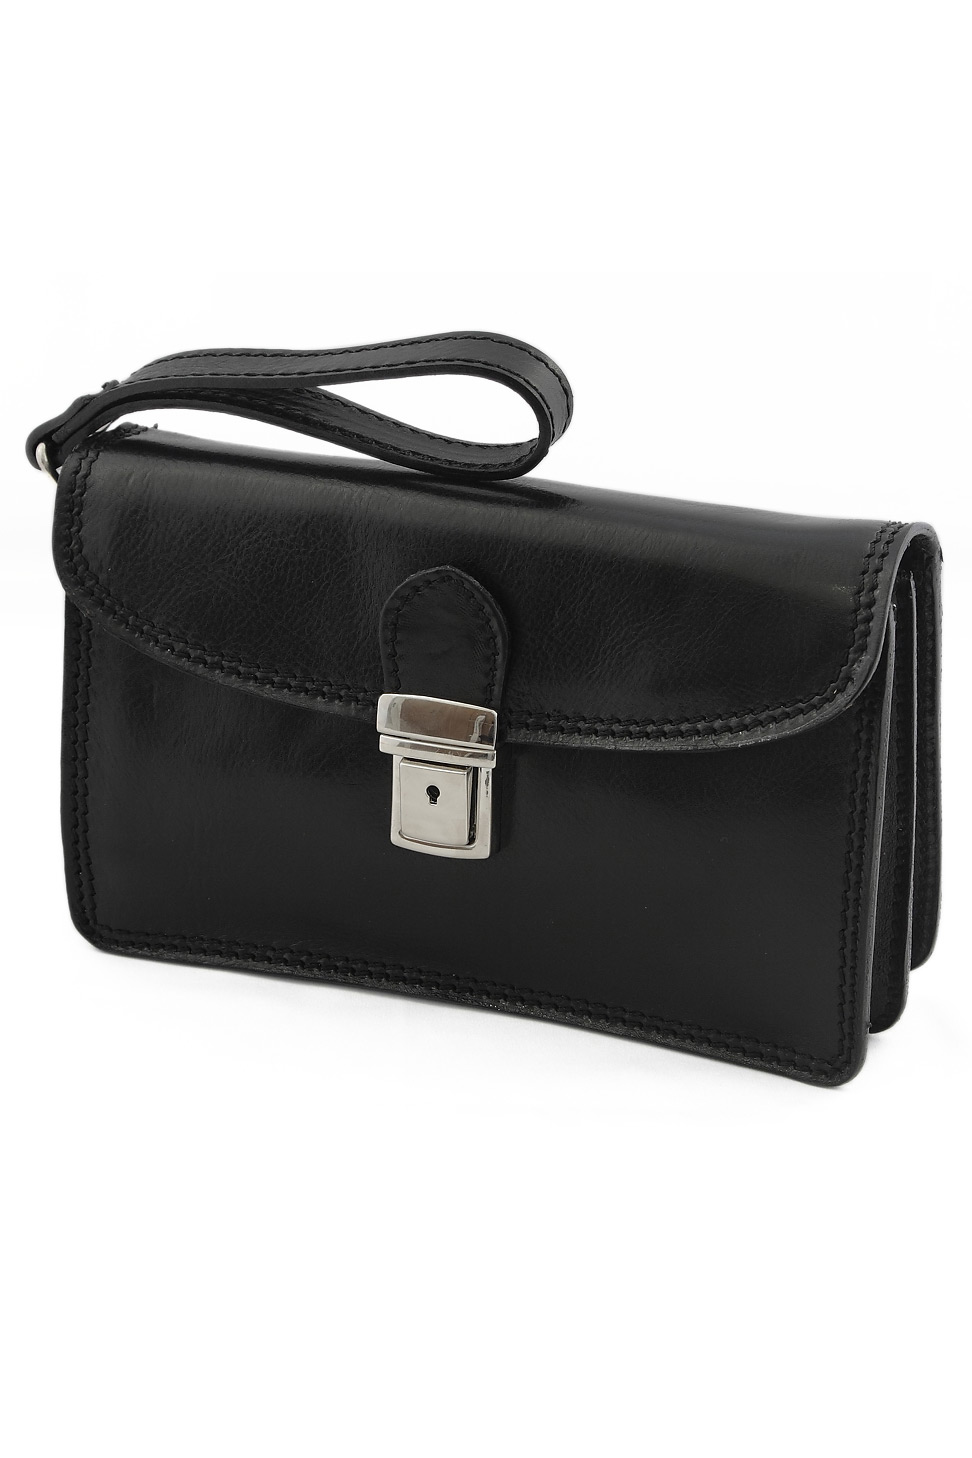 Borseta piele neagra Italia - design elegant